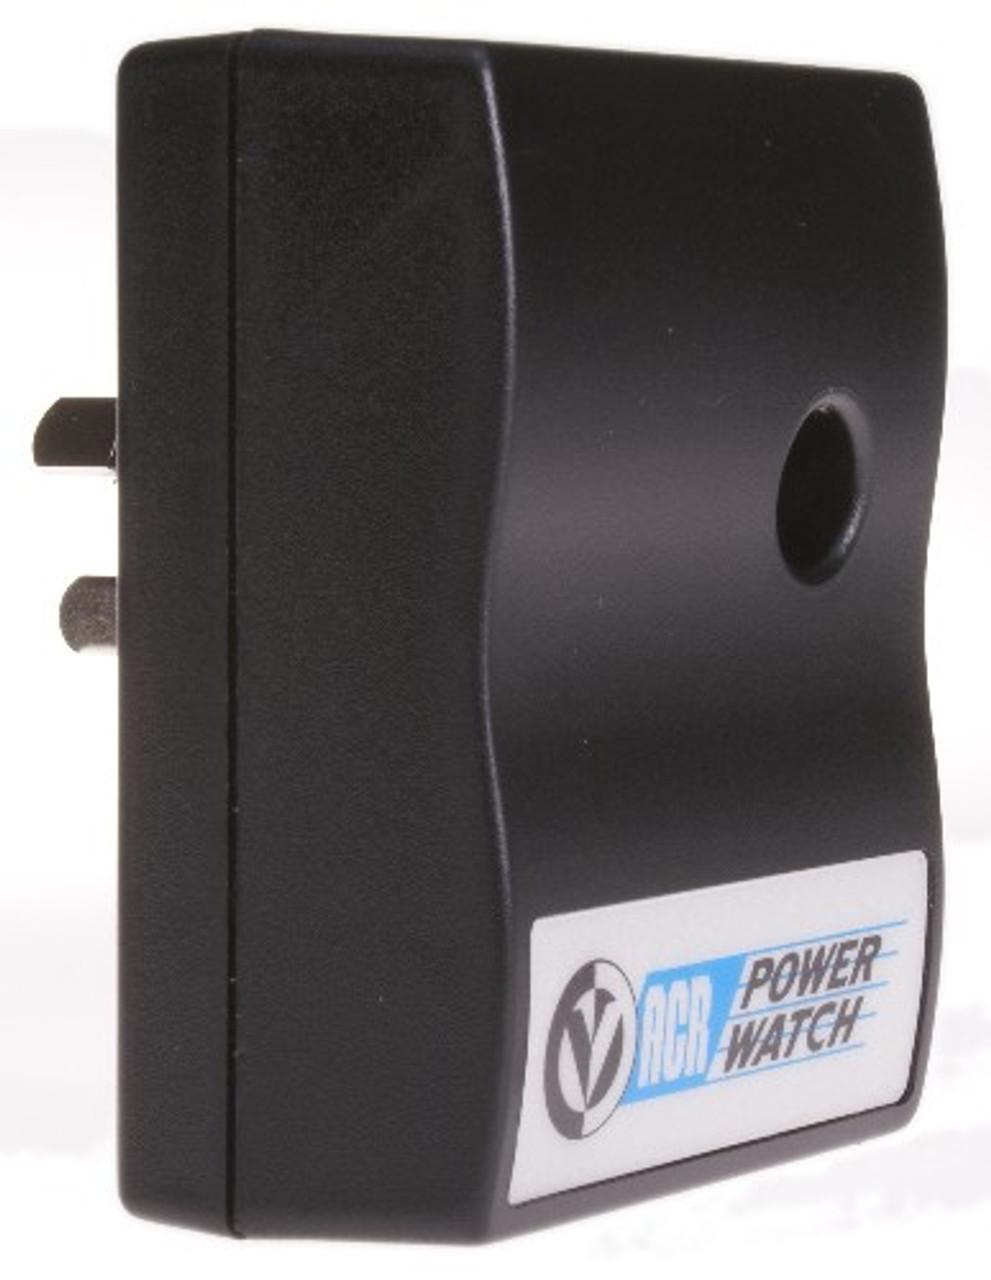 ACR PowerWatch PWV-002-A side